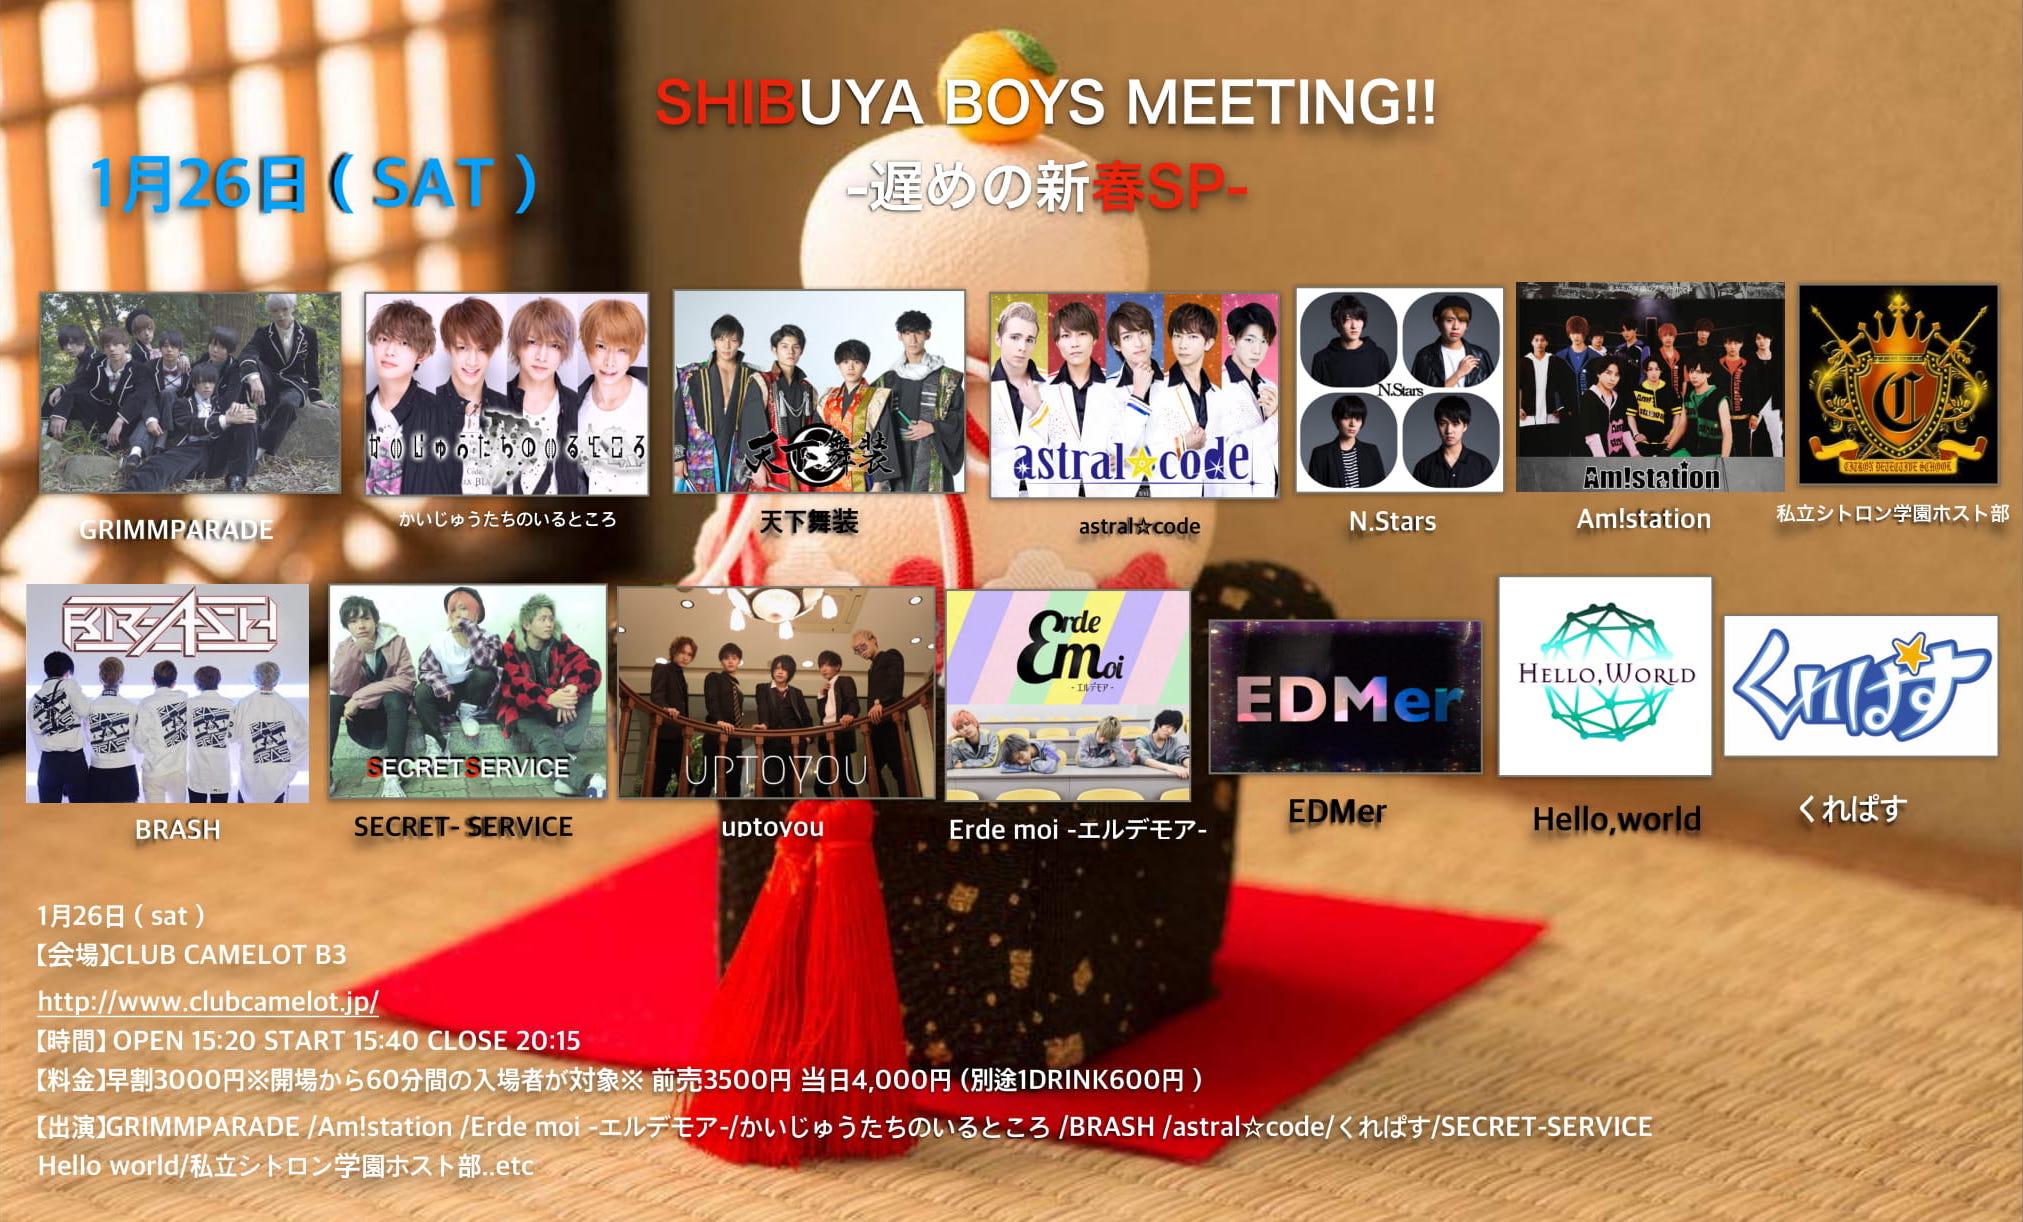 『SHIBUYA BOYS MEETING!! -遅めの新春SP-』